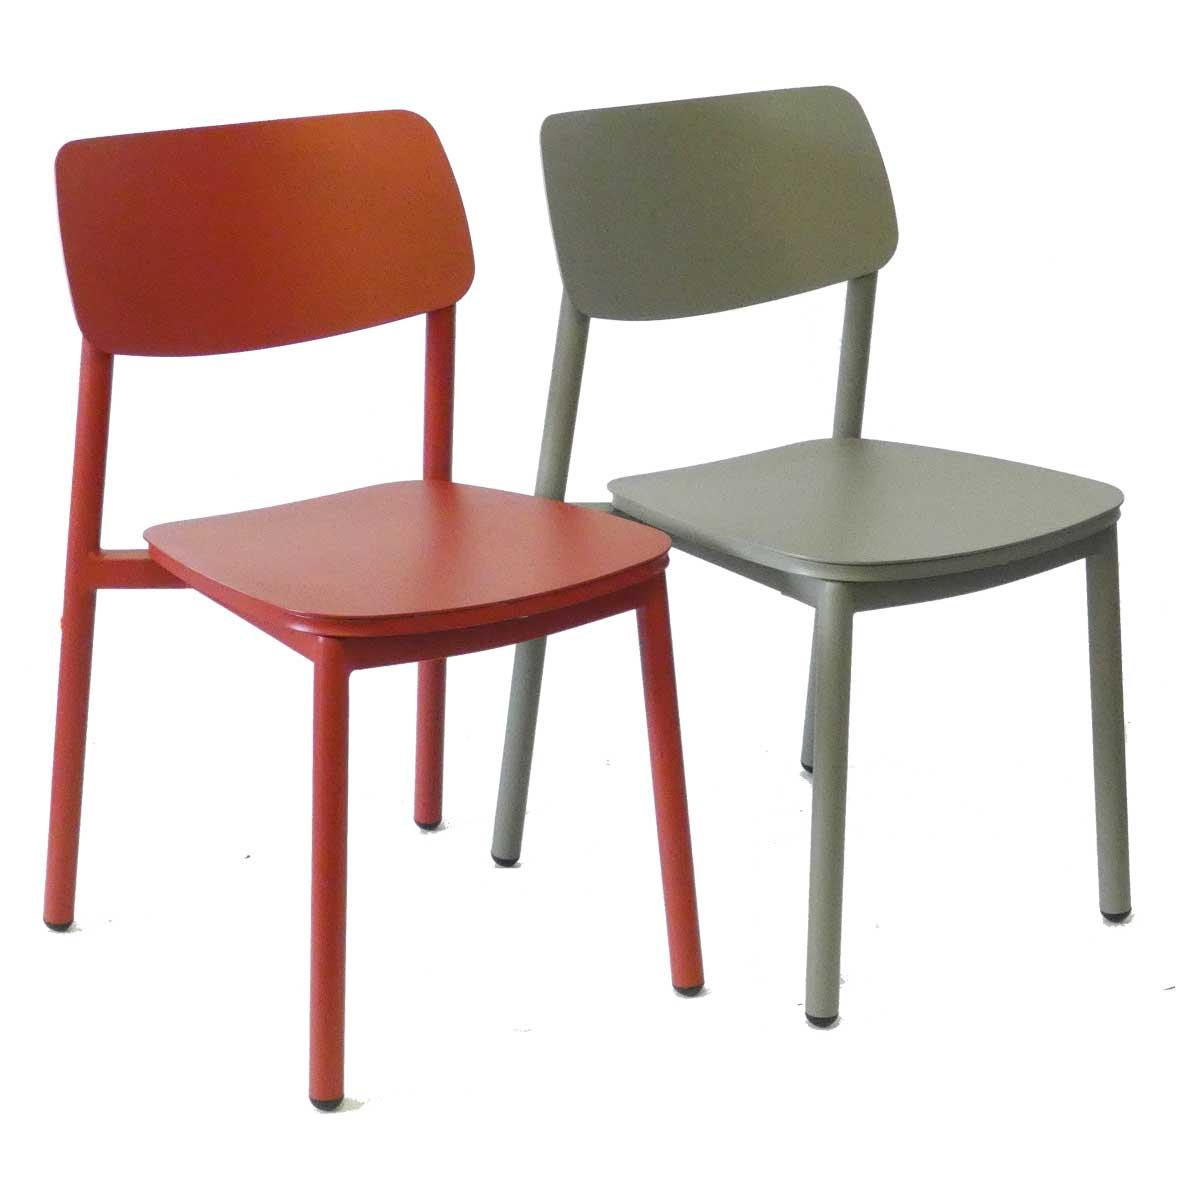 rimini c red green 01 - https://www.werzalit.com/fr/produit/rimini-stuhl-2/